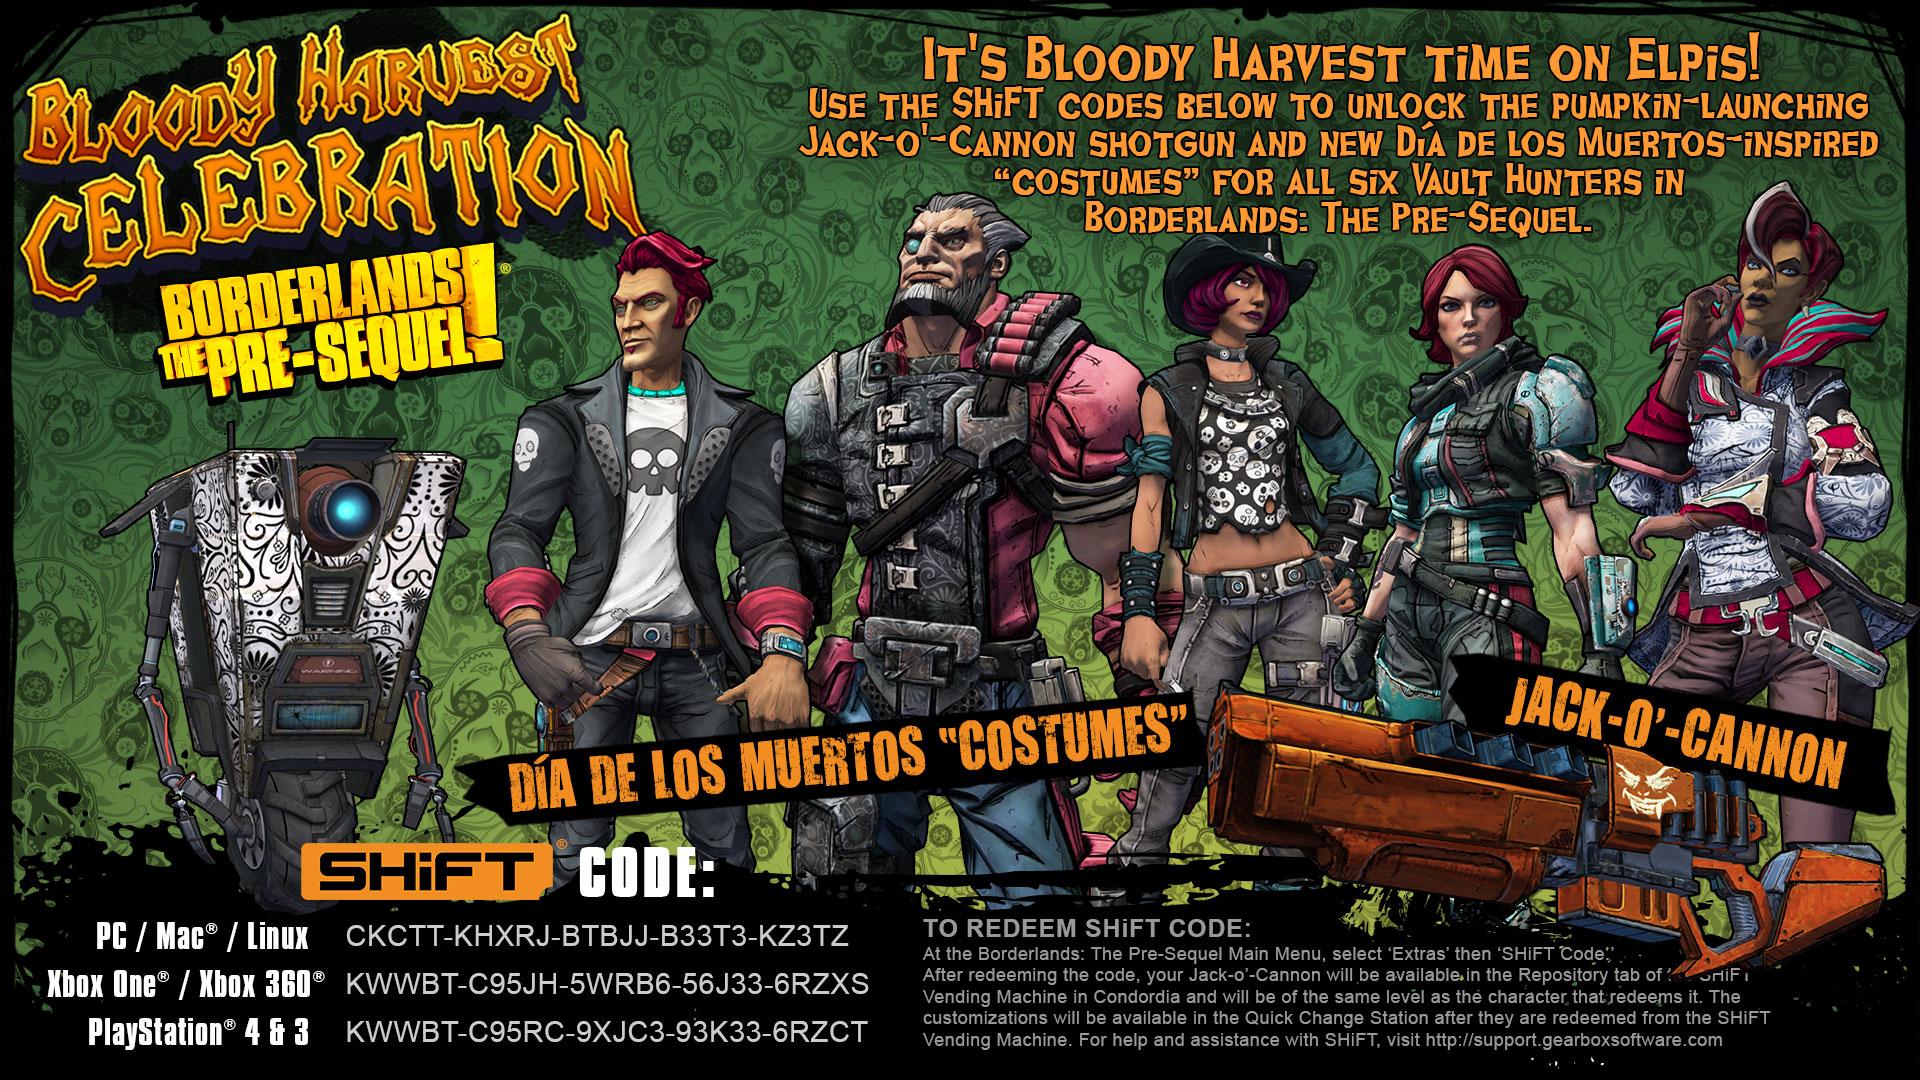 Borderlands: The Pre-Sequel Bloody Harvest SHiFT Codes